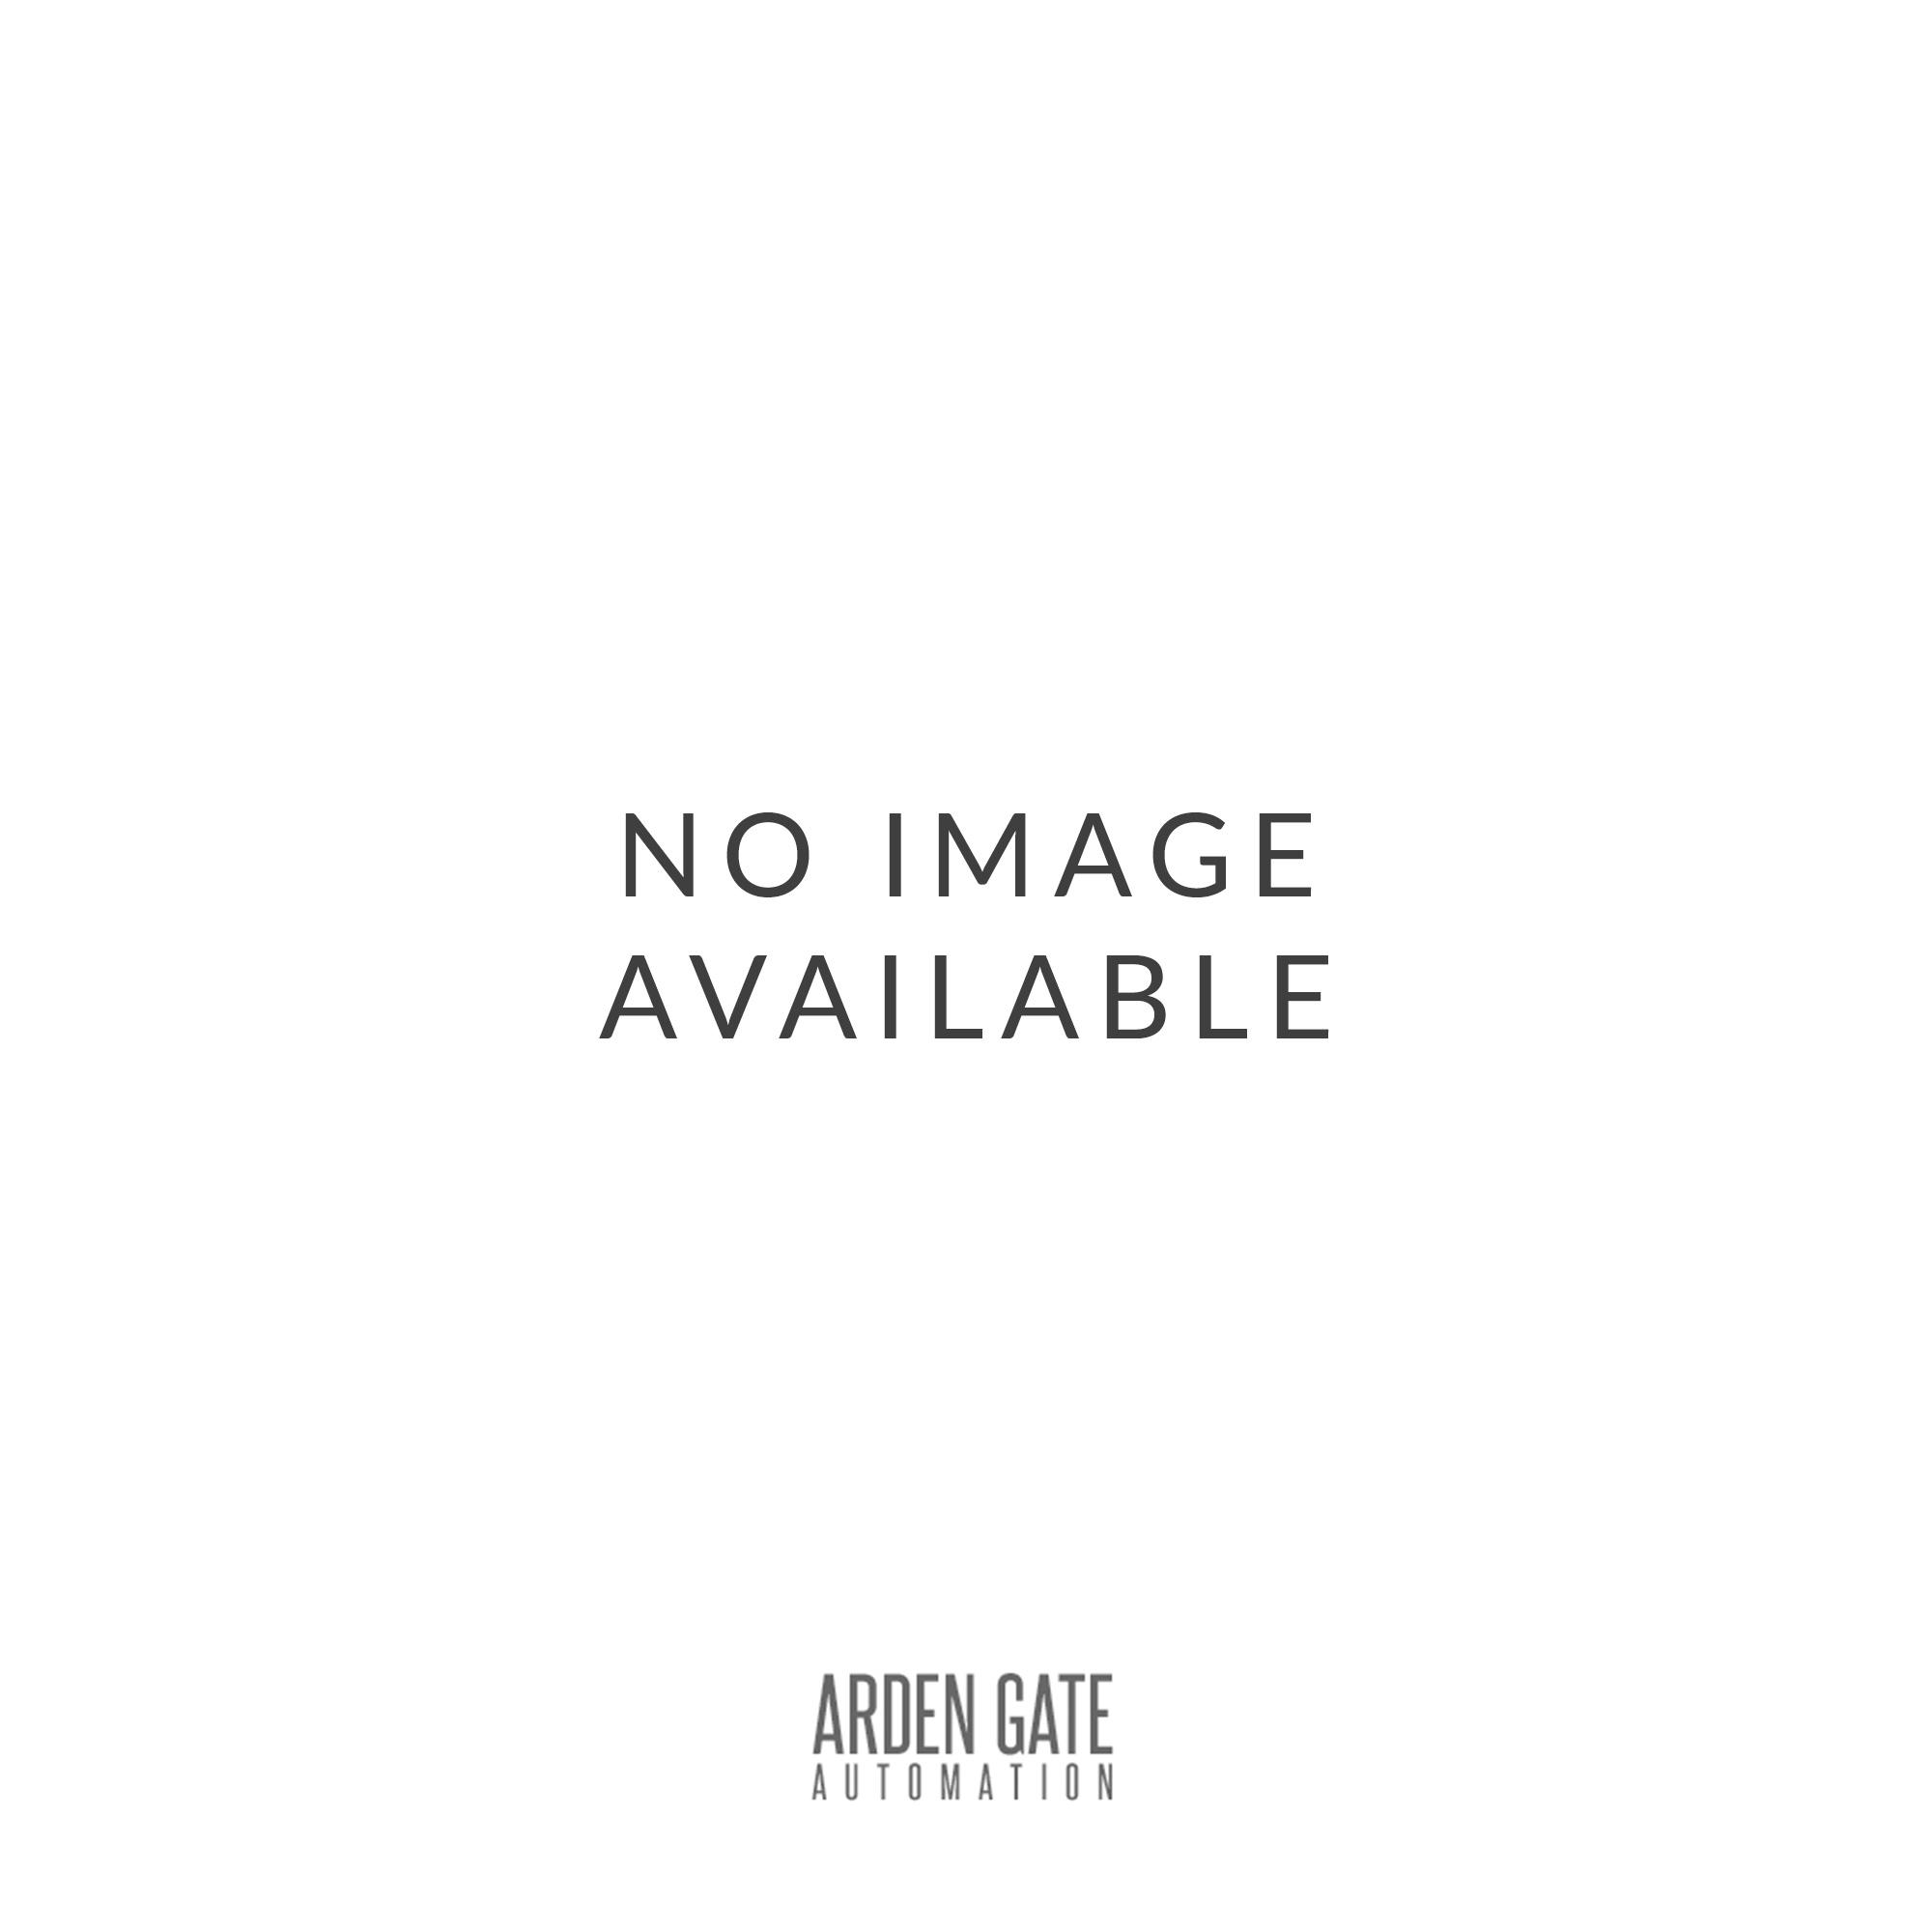 CDVI Universal Relay, 12-24Vac/dc